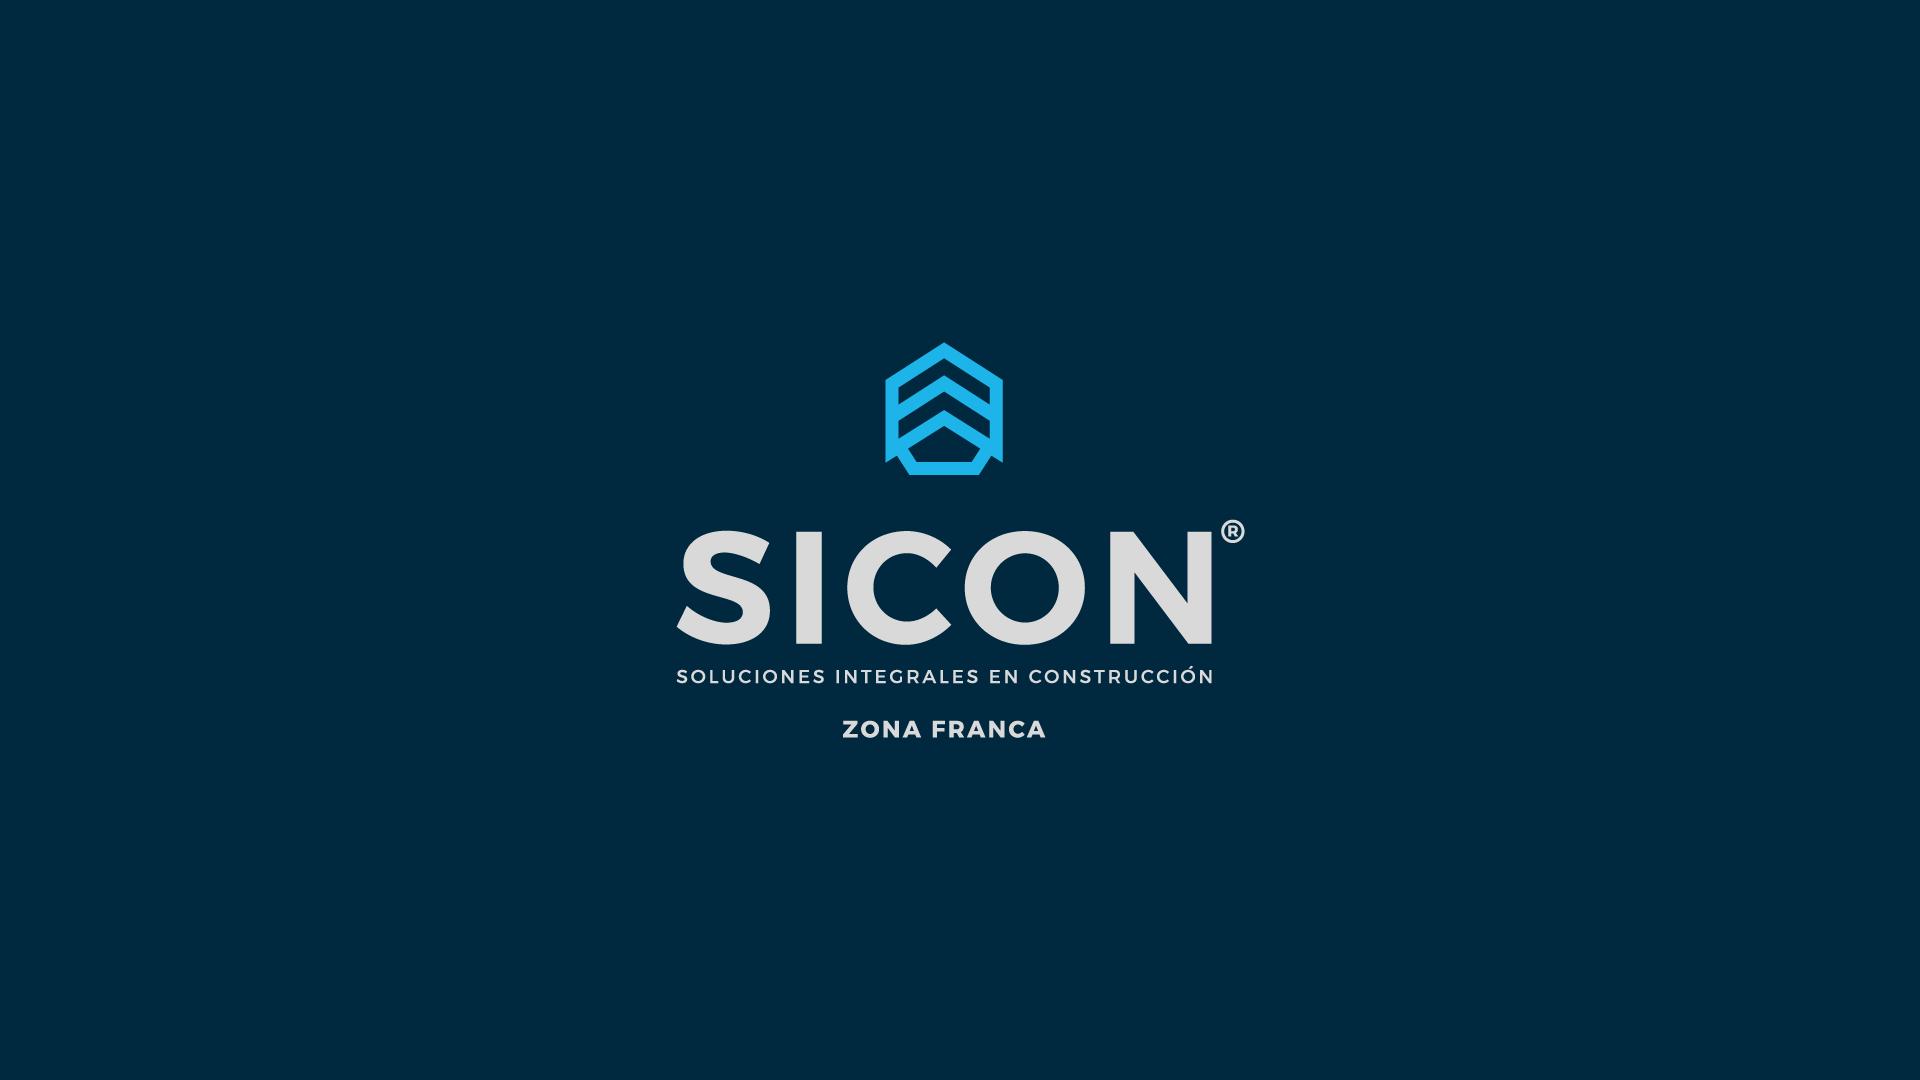 Sicon-Brandi-Logo-Cali-agencia-de-diseño